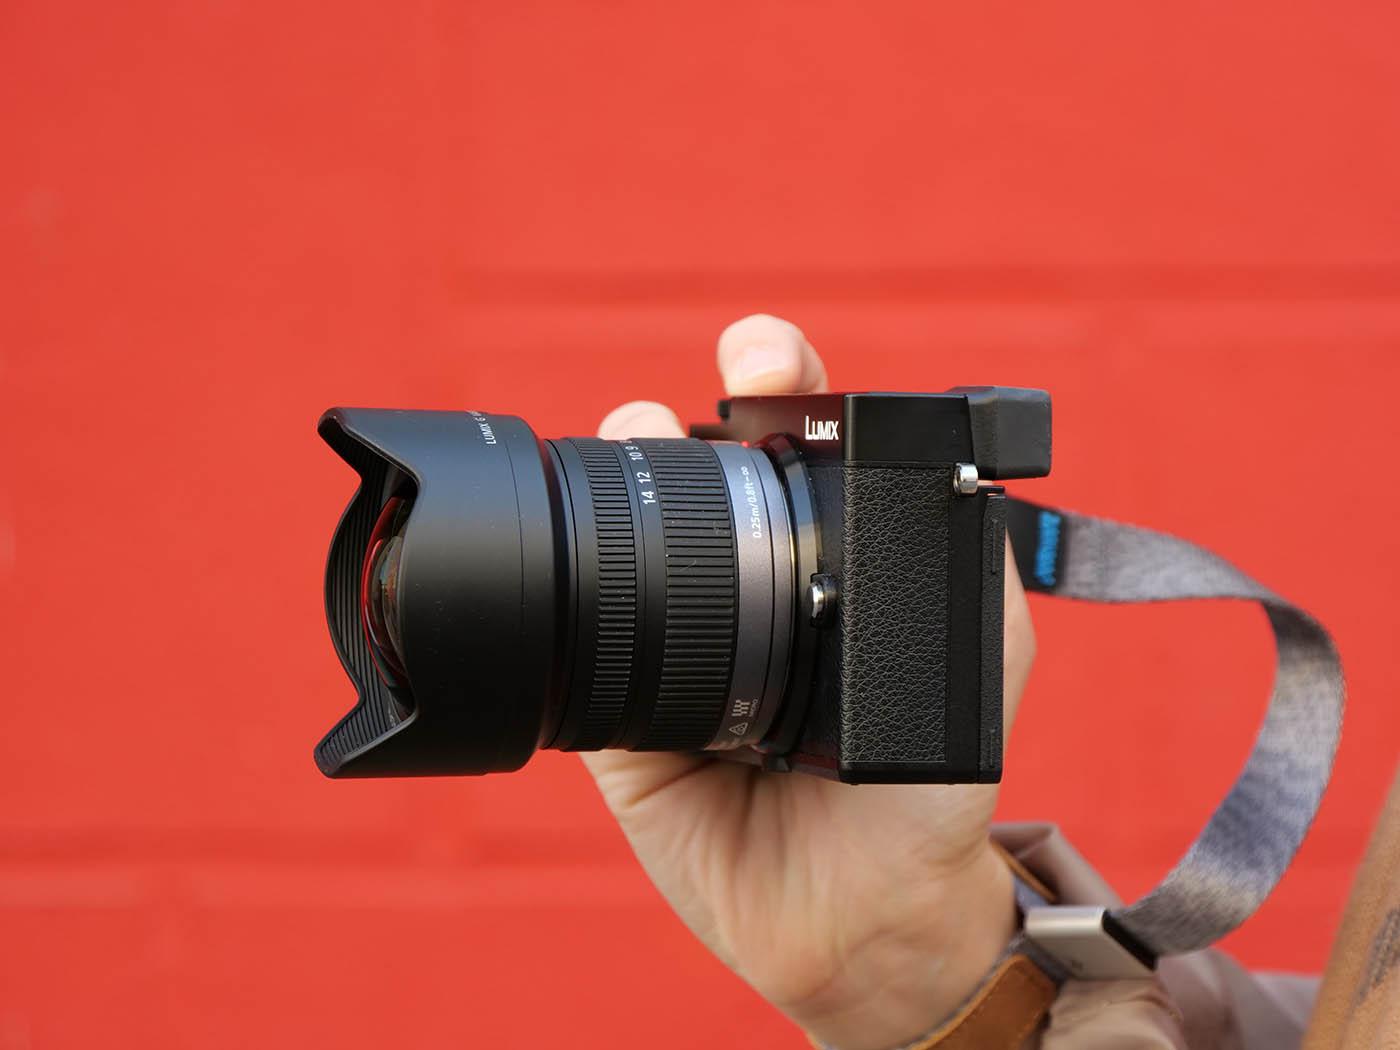 objectif grand angle Panasonic 7-14 mm f4.0